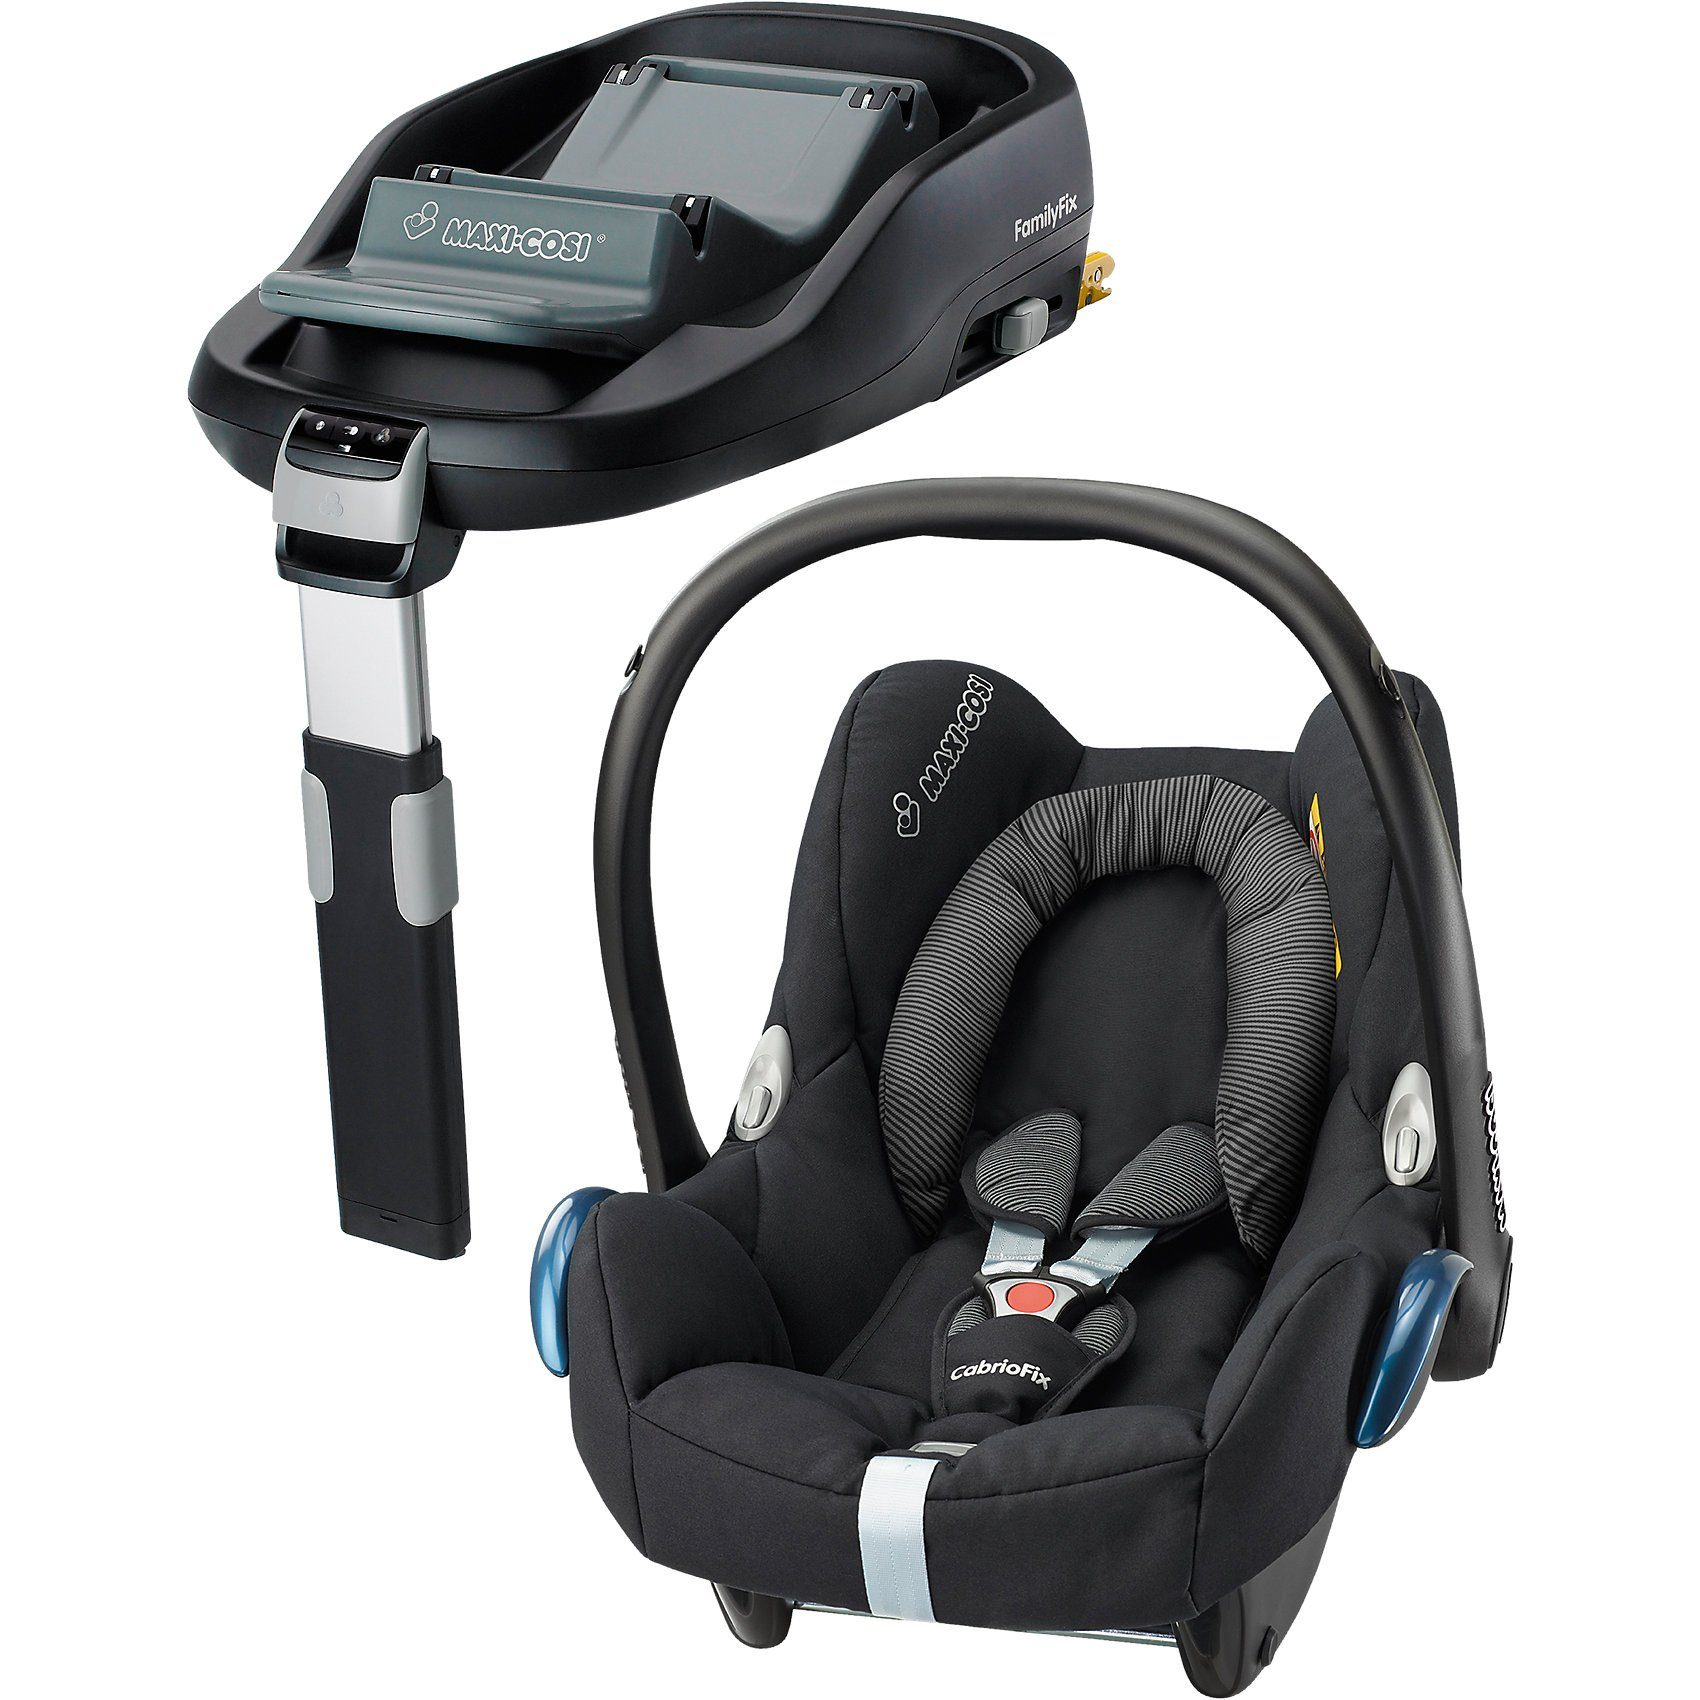 Maxi-Cosi Babyschale Cabriofix, black raven, inkl. FamilyFix